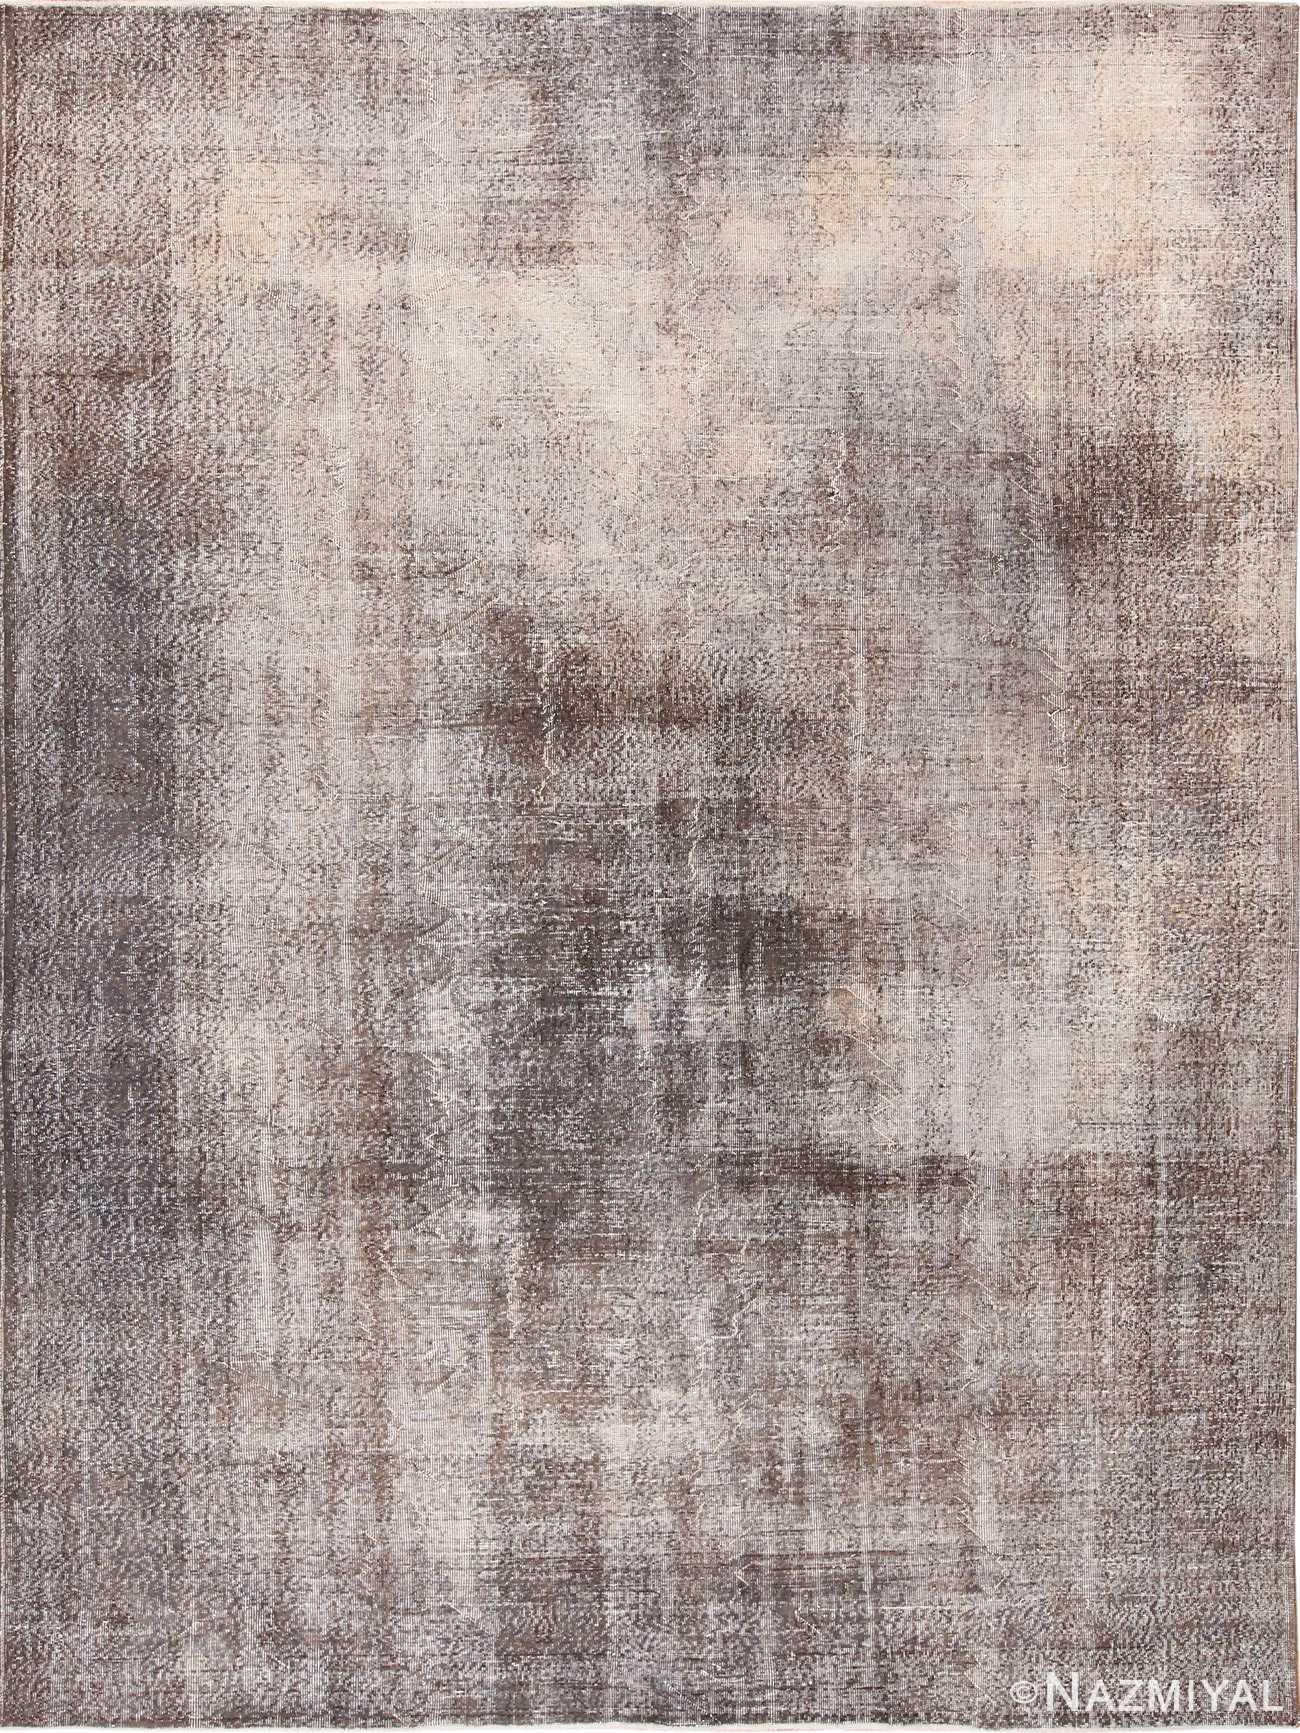 Earthy Mushroom Grey Vintage Room Size Worn Distressed Shabby Chic Turkish Sivas Rug 49695 by Nazmiyal